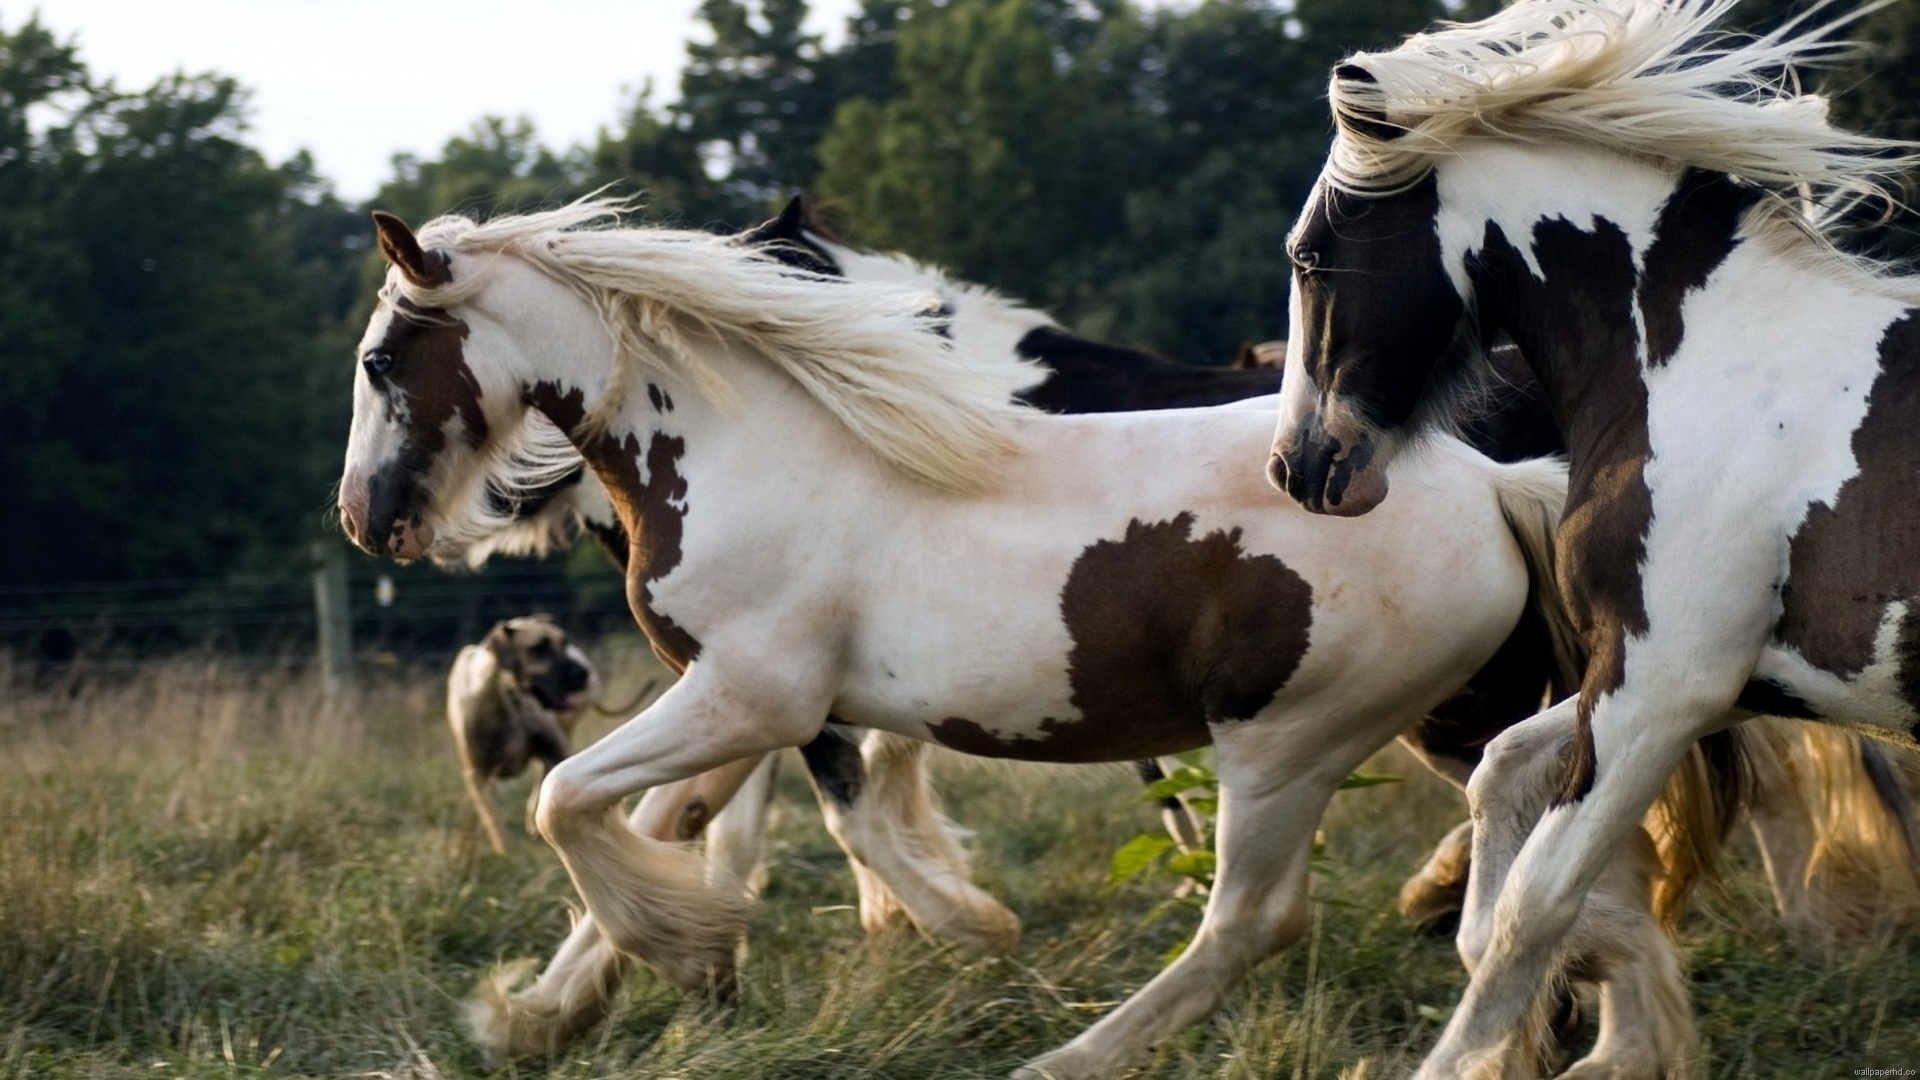 High Resolution Image Of Running Horses 1920x1080 Wallpaper Teahub Io